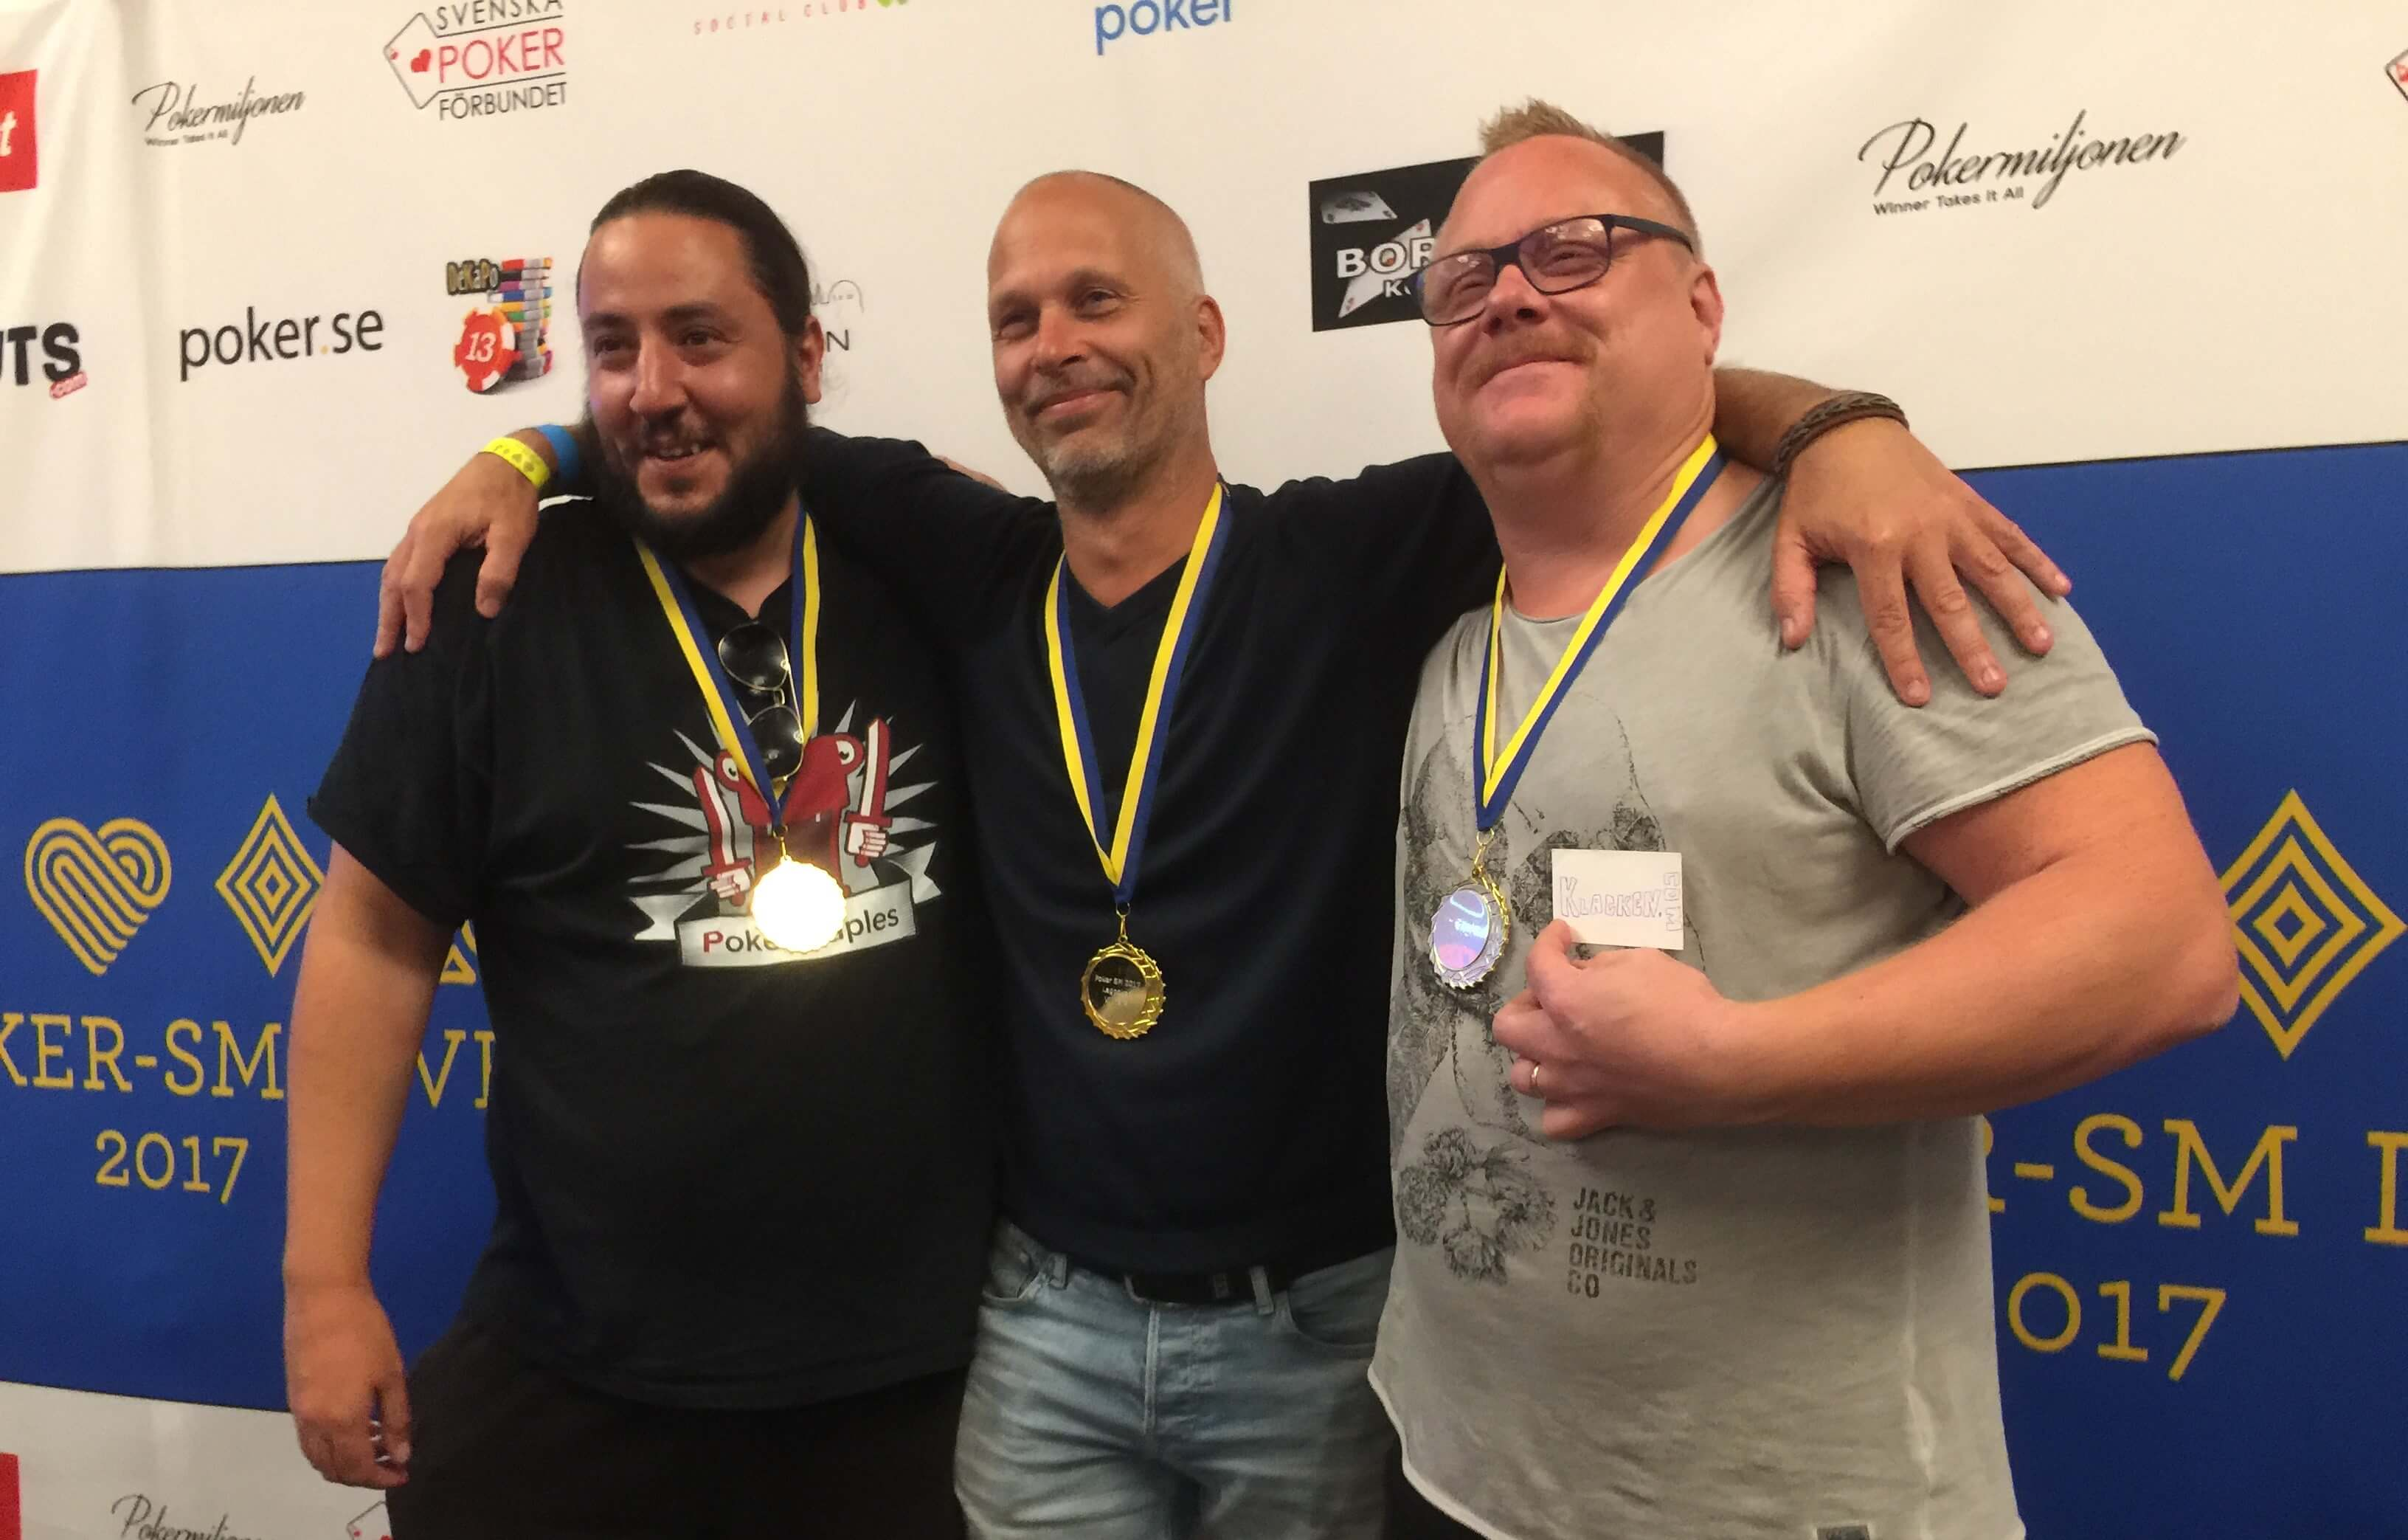 Adam Romdhane, Christer Pettersson och Thomas Holm, vinnare av Lagpoker-SM 2017